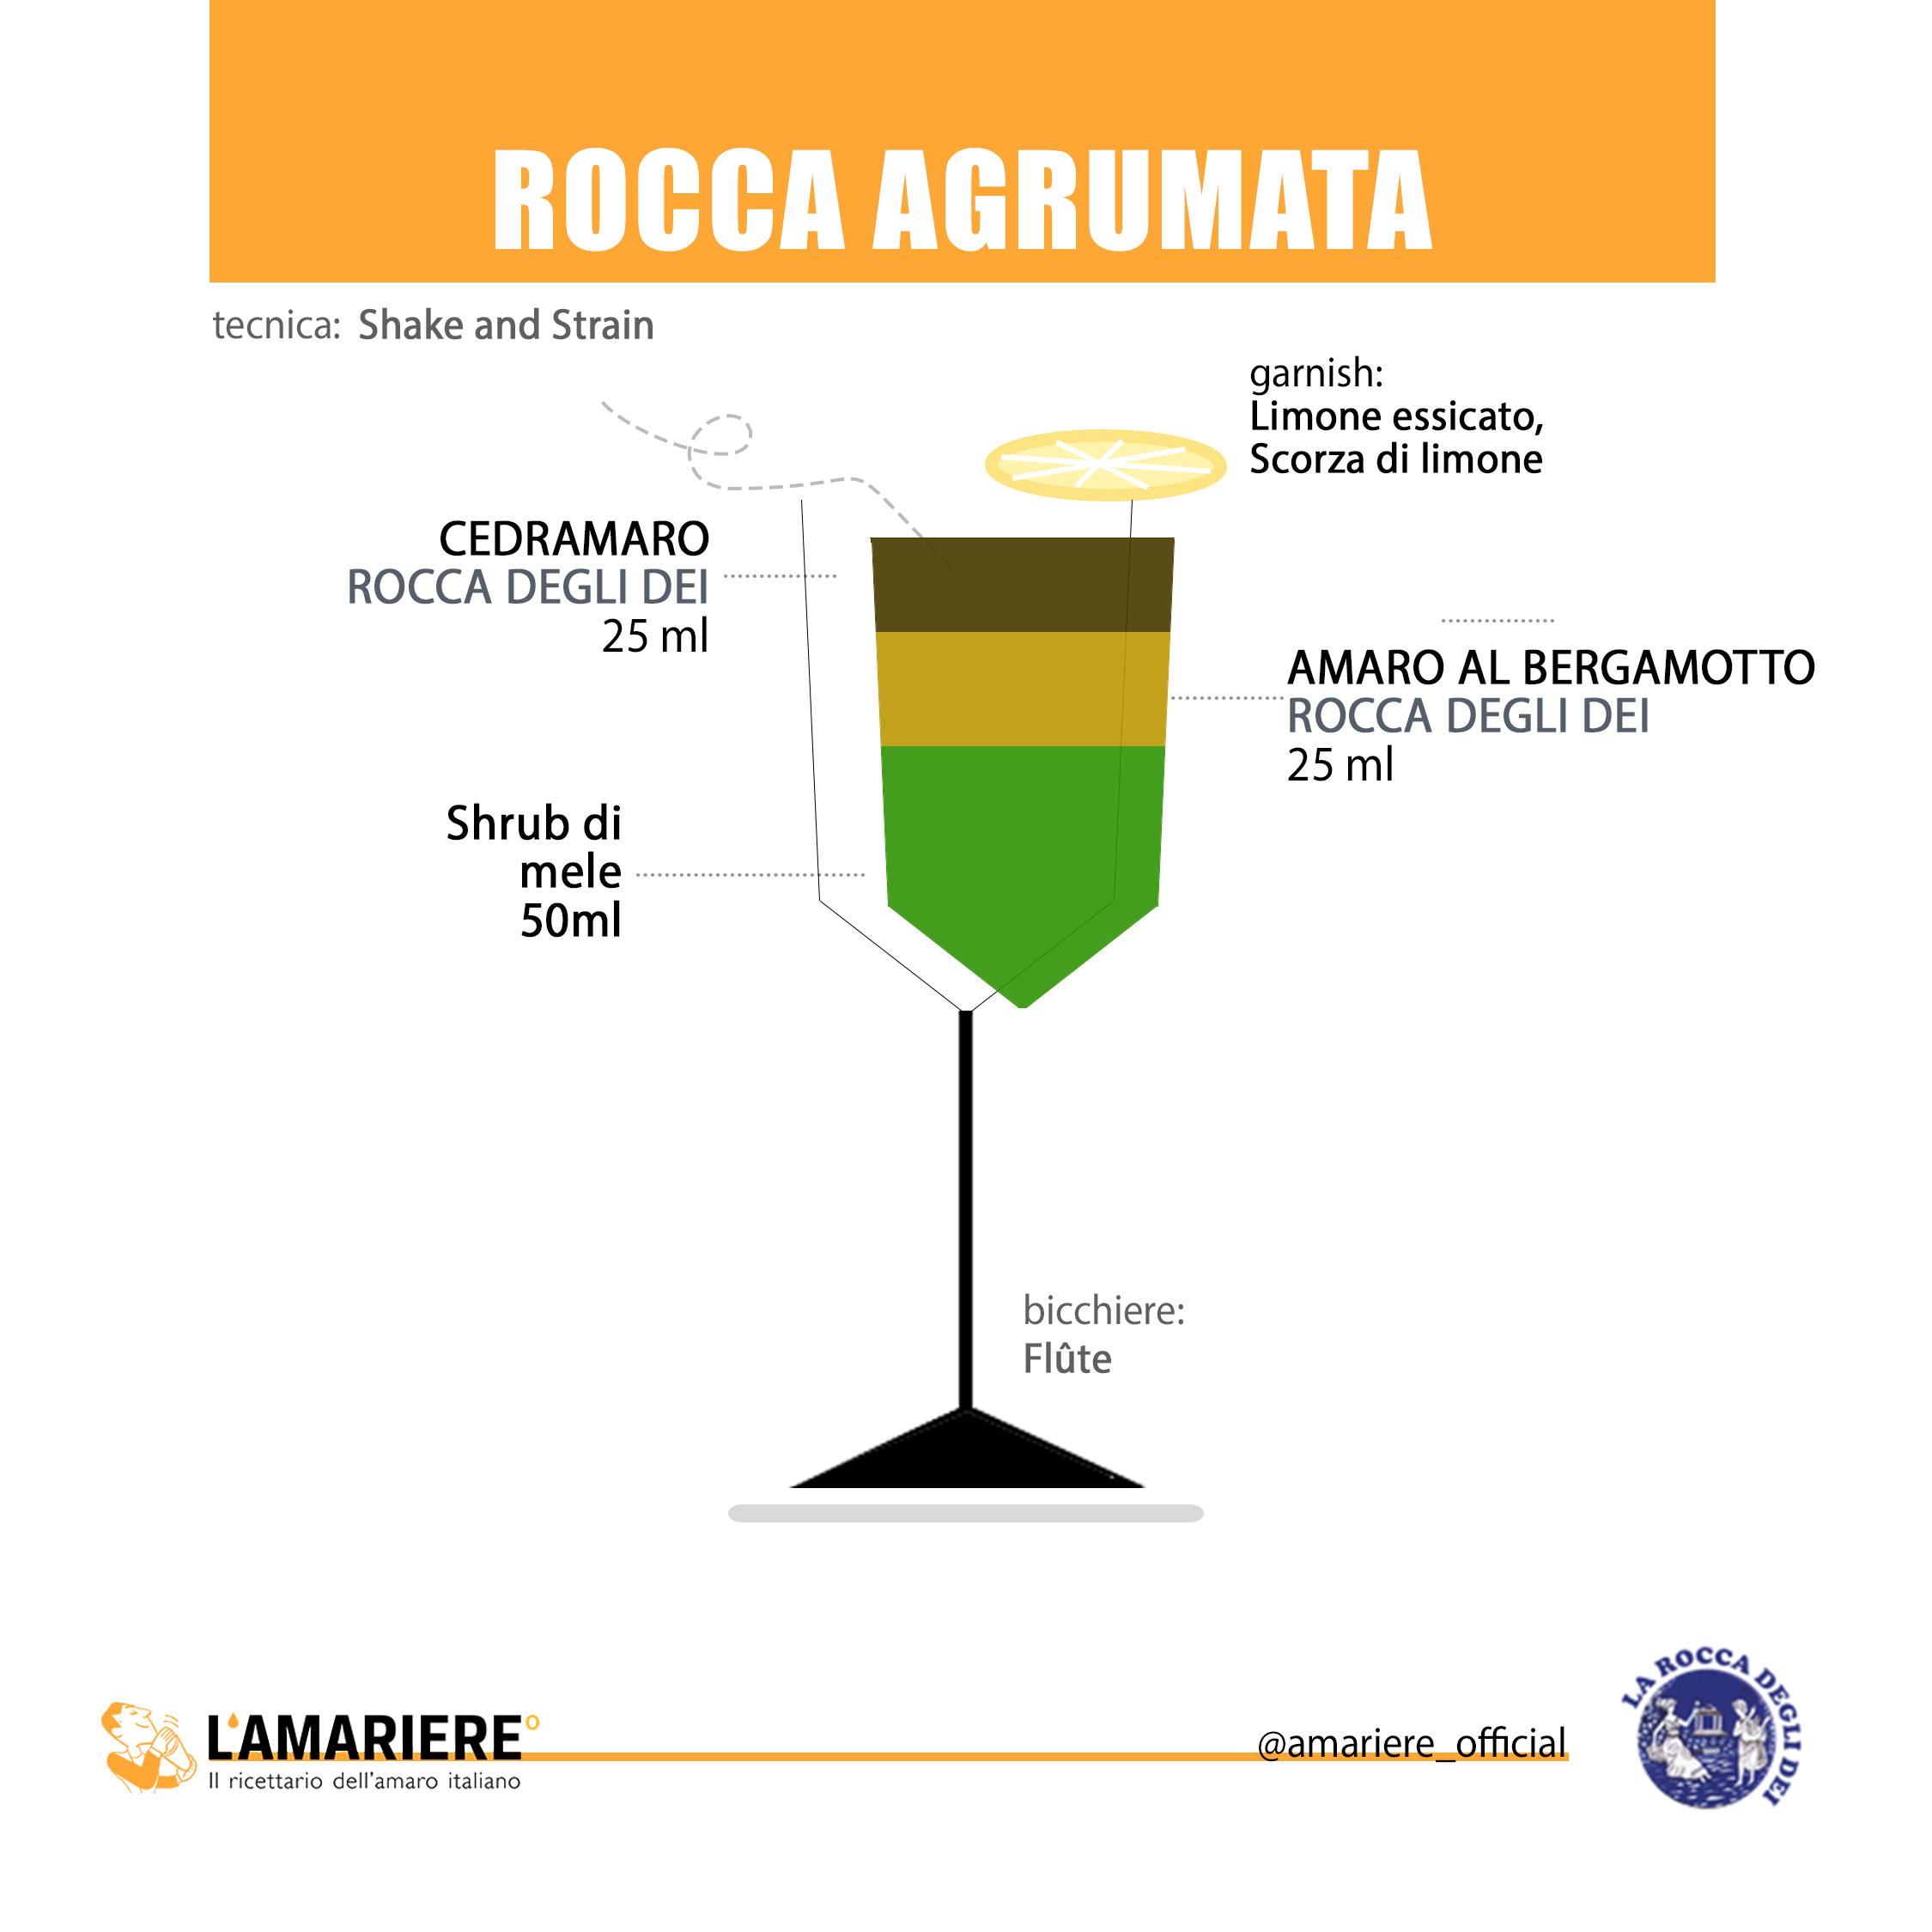 Rocca agrumata